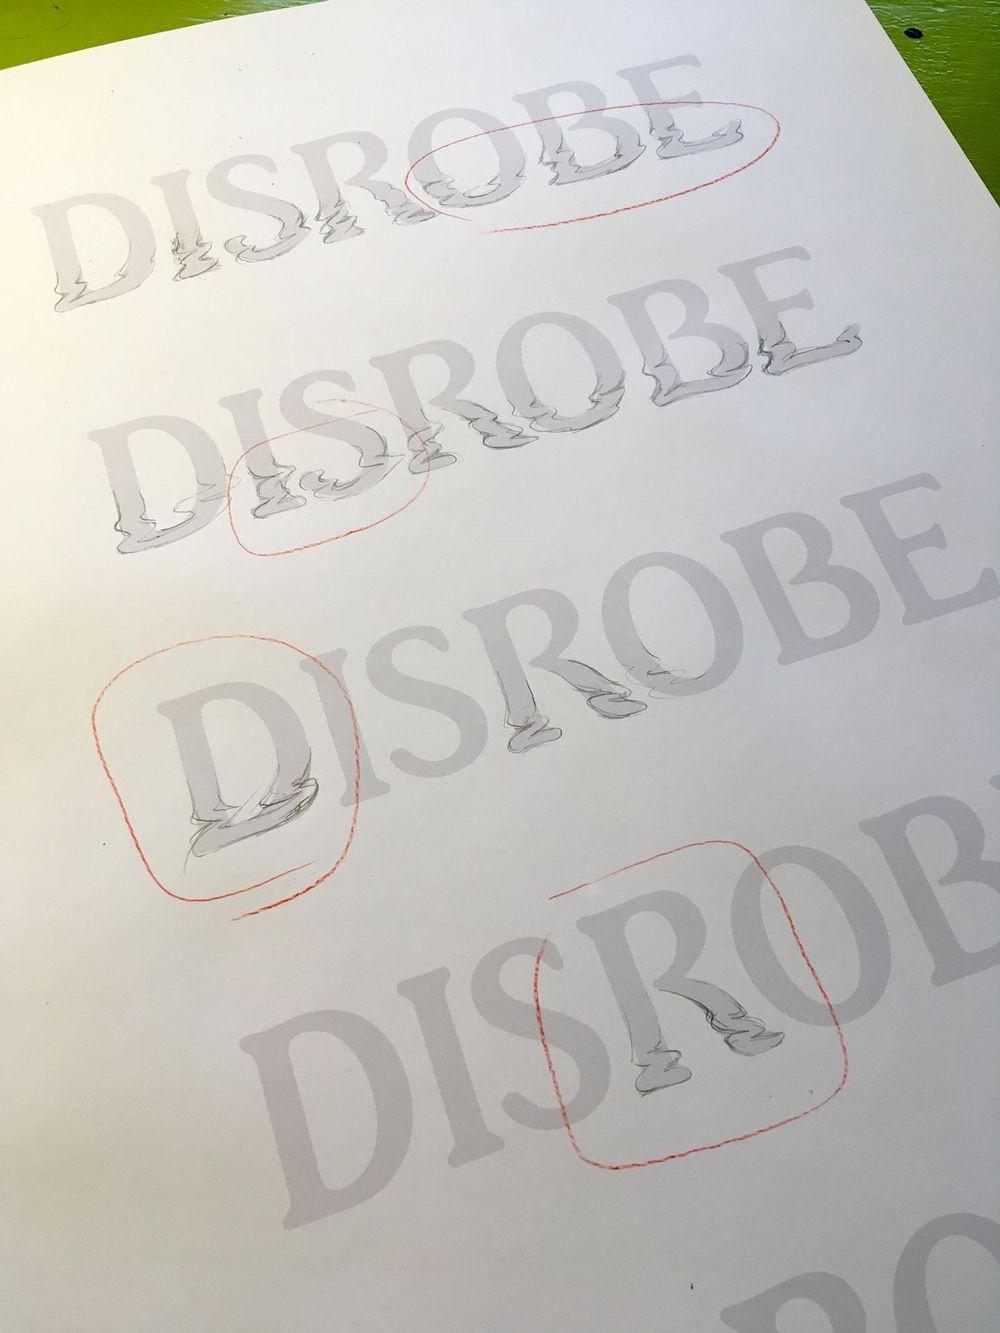 Disrobe Logotype - image 8 - student project